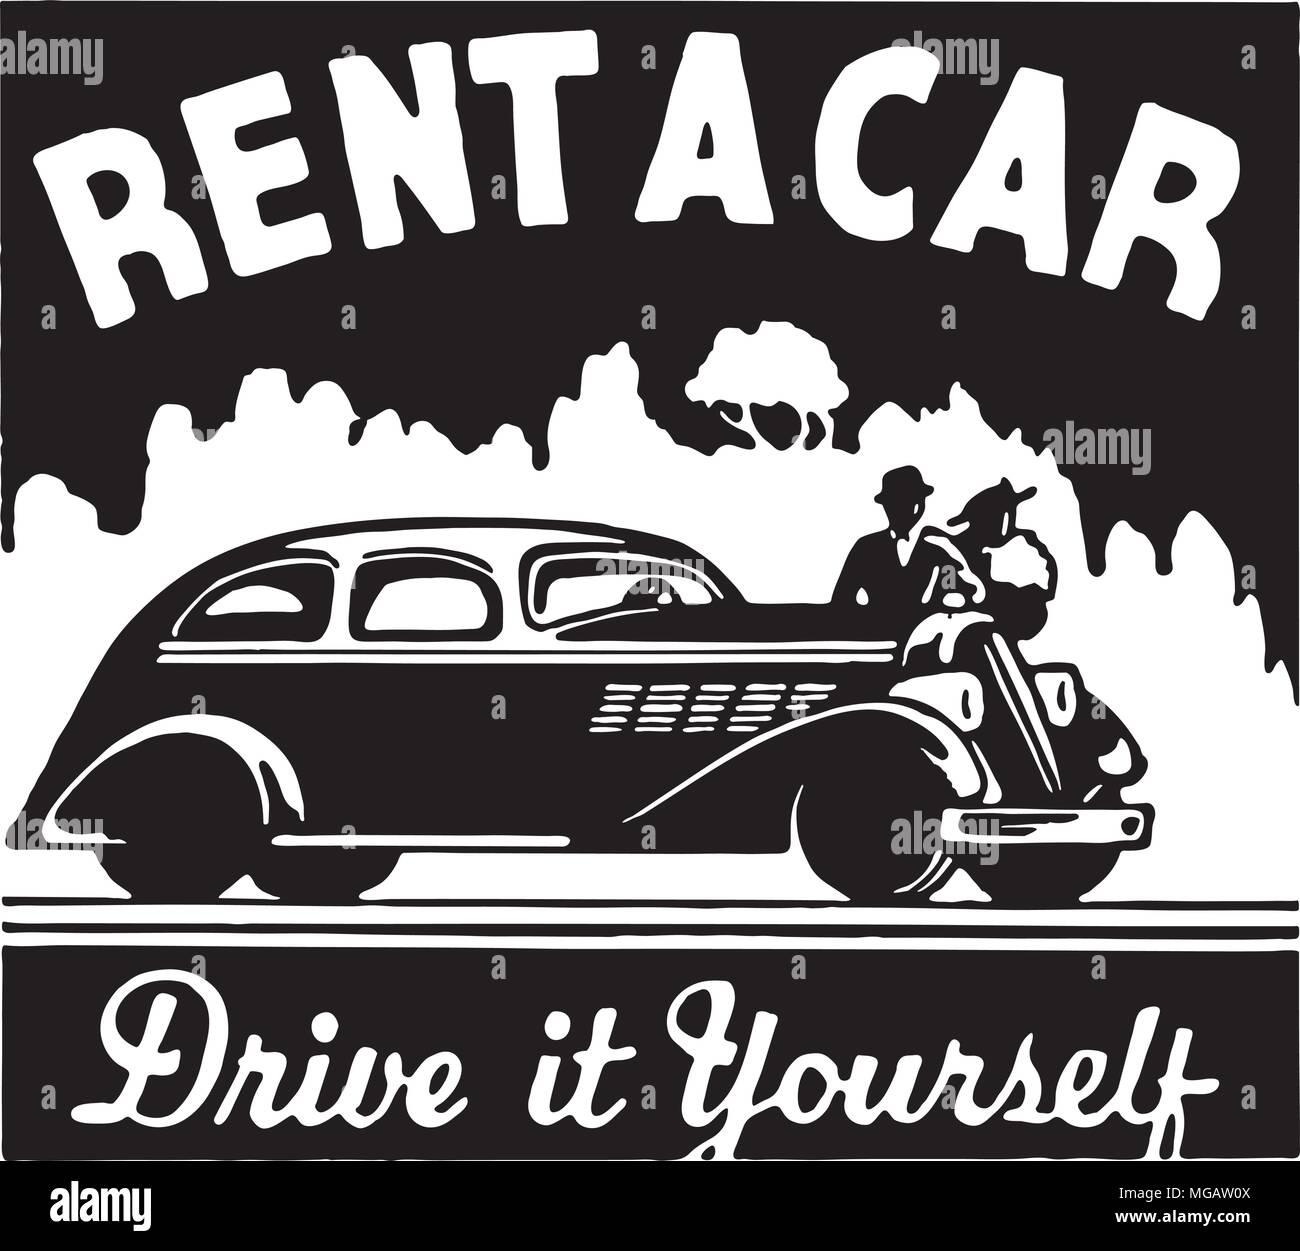 Rent A Car Retro Ad Art Banner Stock Vector Image Art Alamy